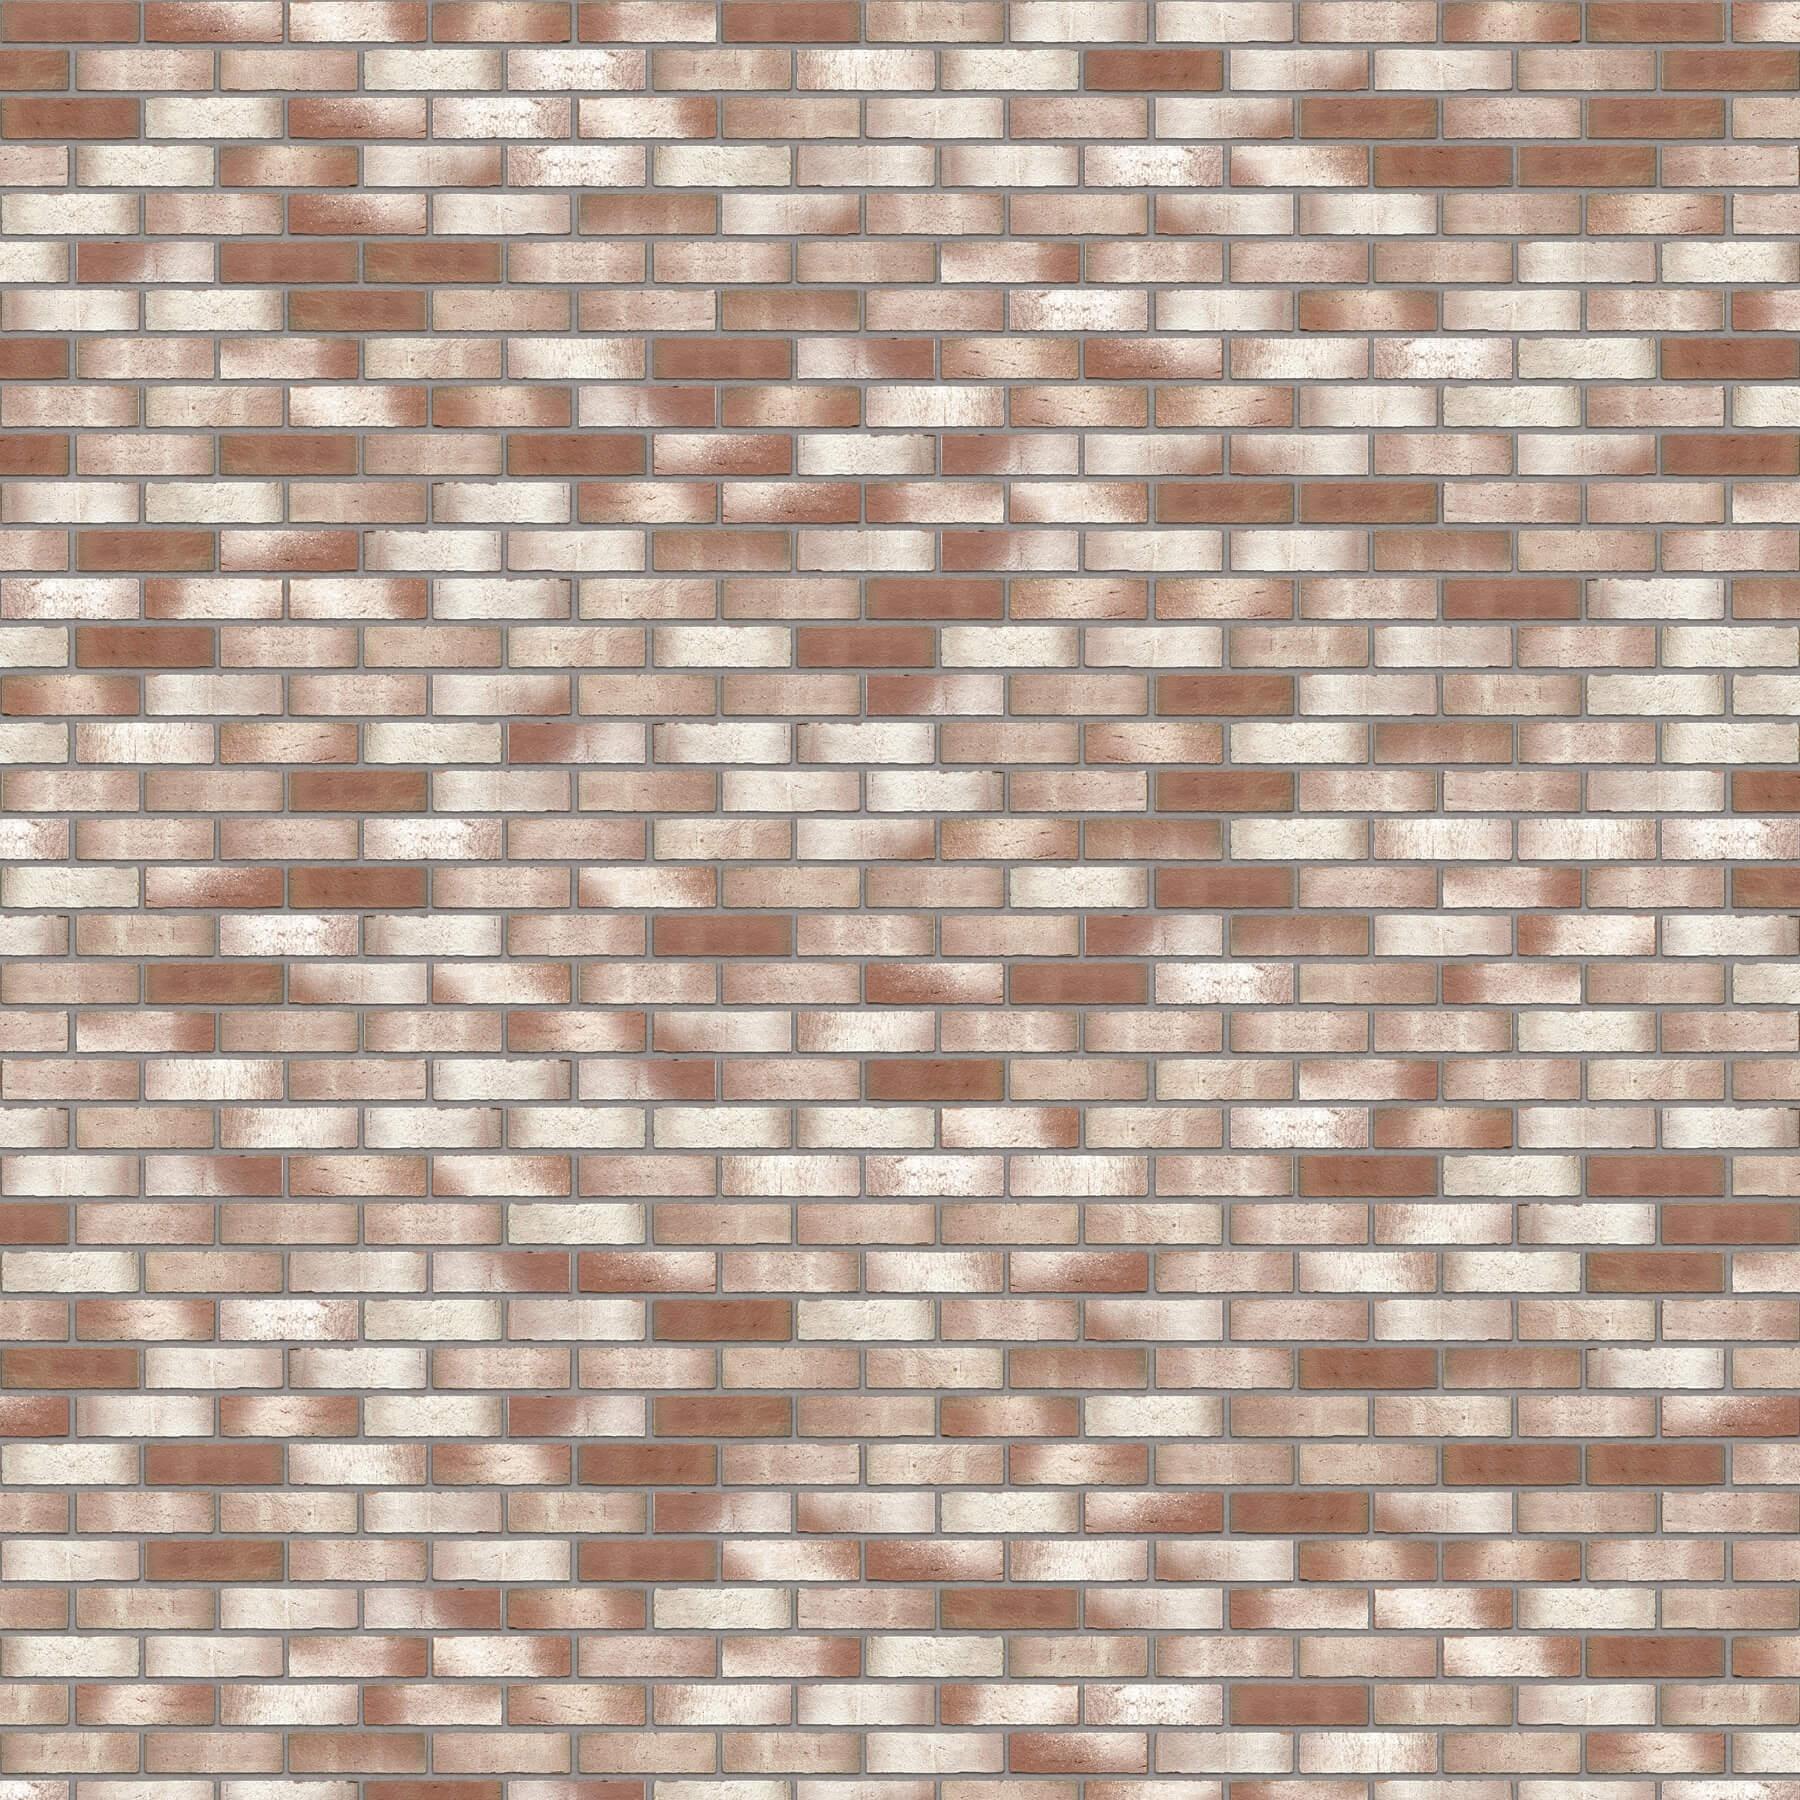 Puna-cigla-FeldHaus-Klinker-brick-house-beograd-nf-k-923-Siva Fuga